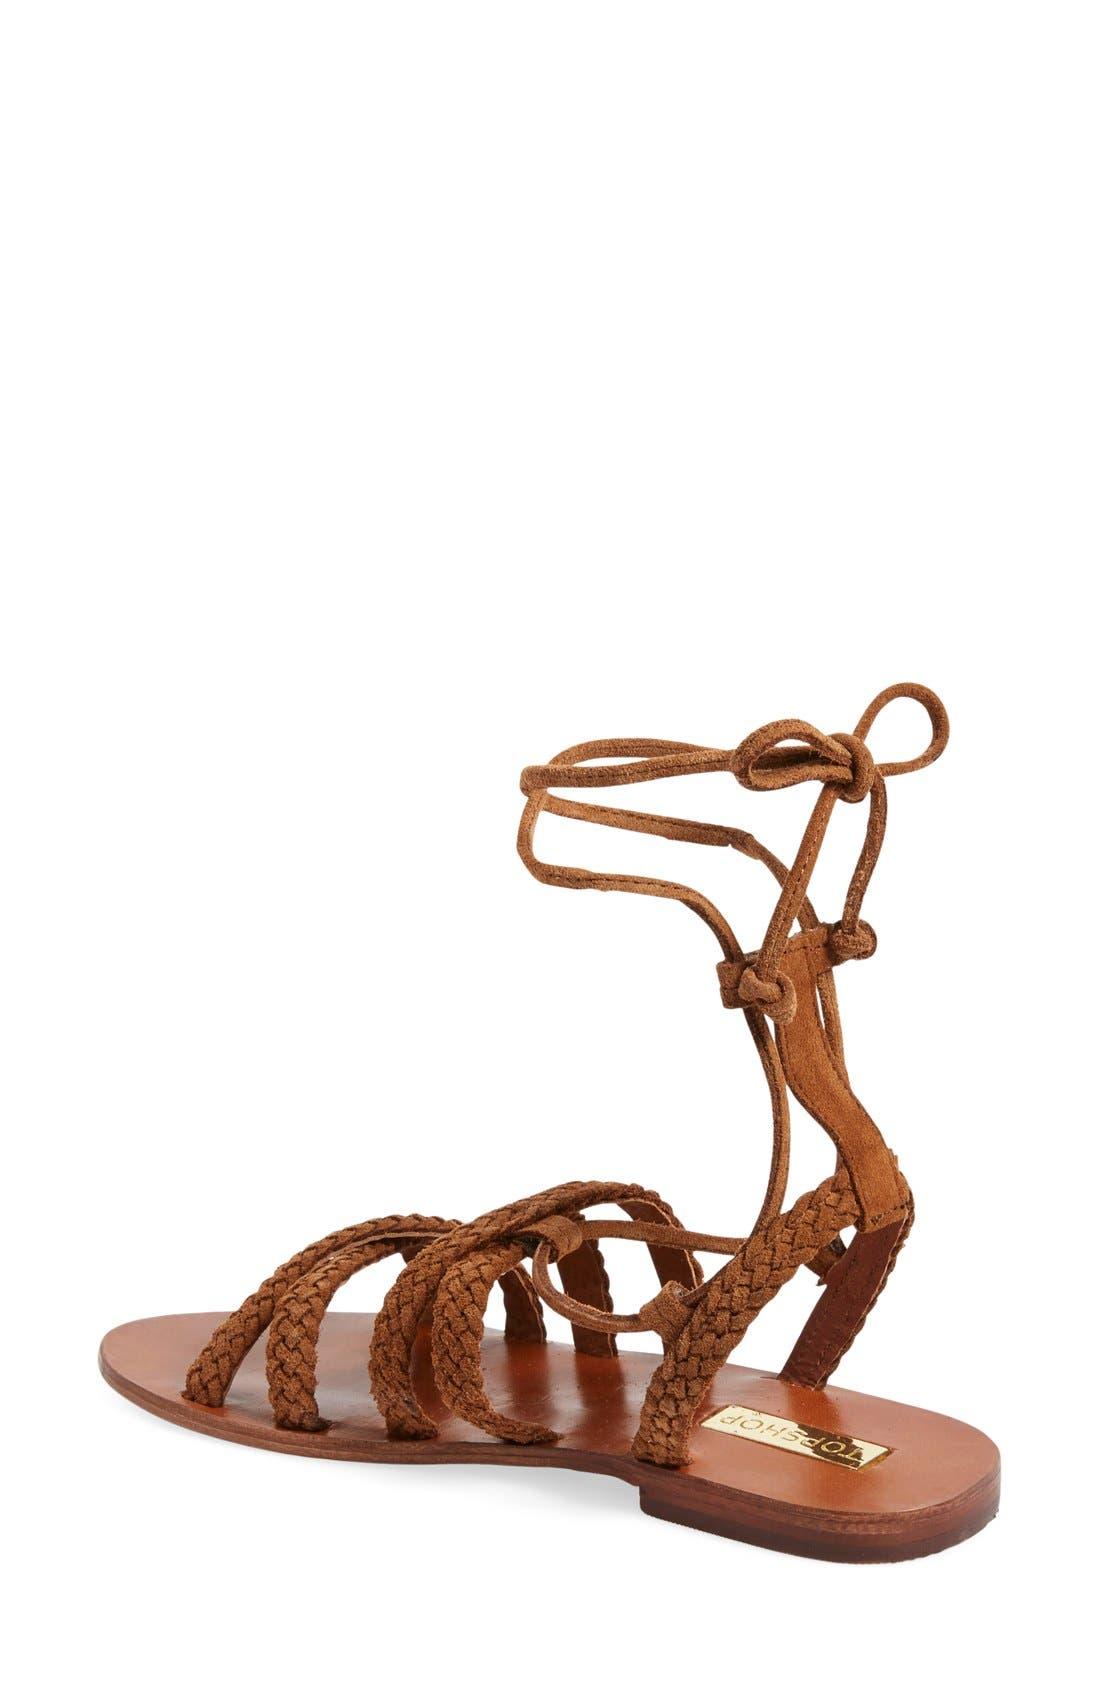 Alternate Image 2  - Topshop 'Farewell' Gladiator Sandals (Women)